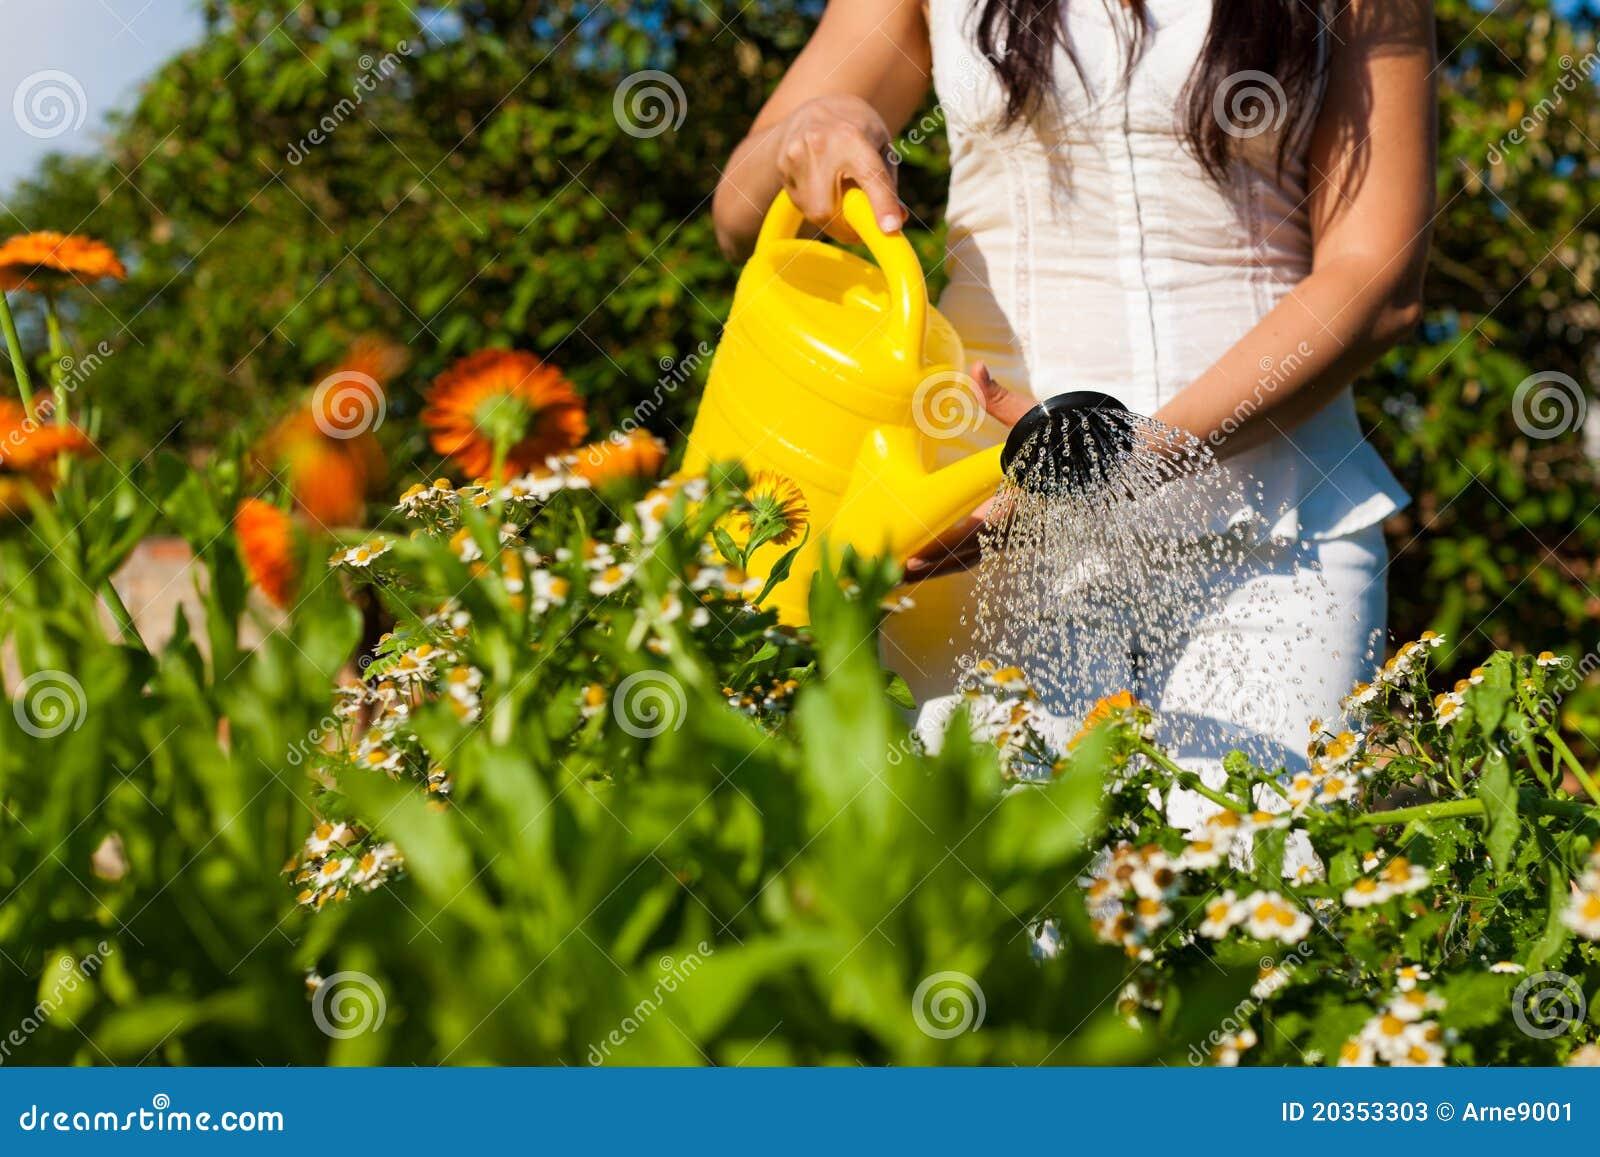 Gardening In Summer   Woman Watering Flowers. Domestic, Hobby.